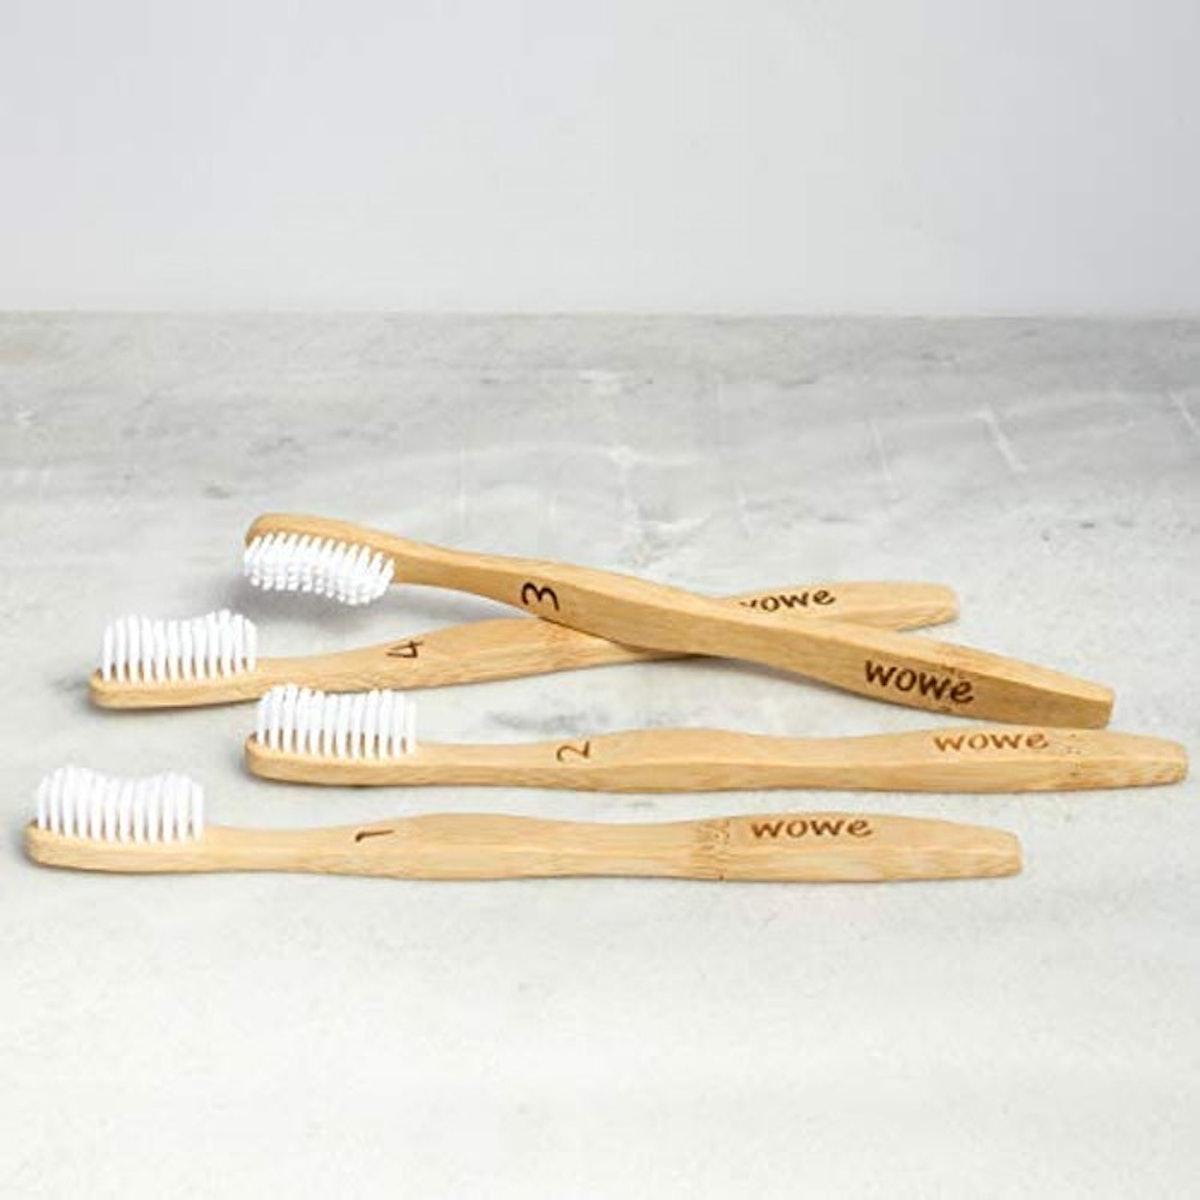 Wowe Bamboo Toothbrush (4 Pack)